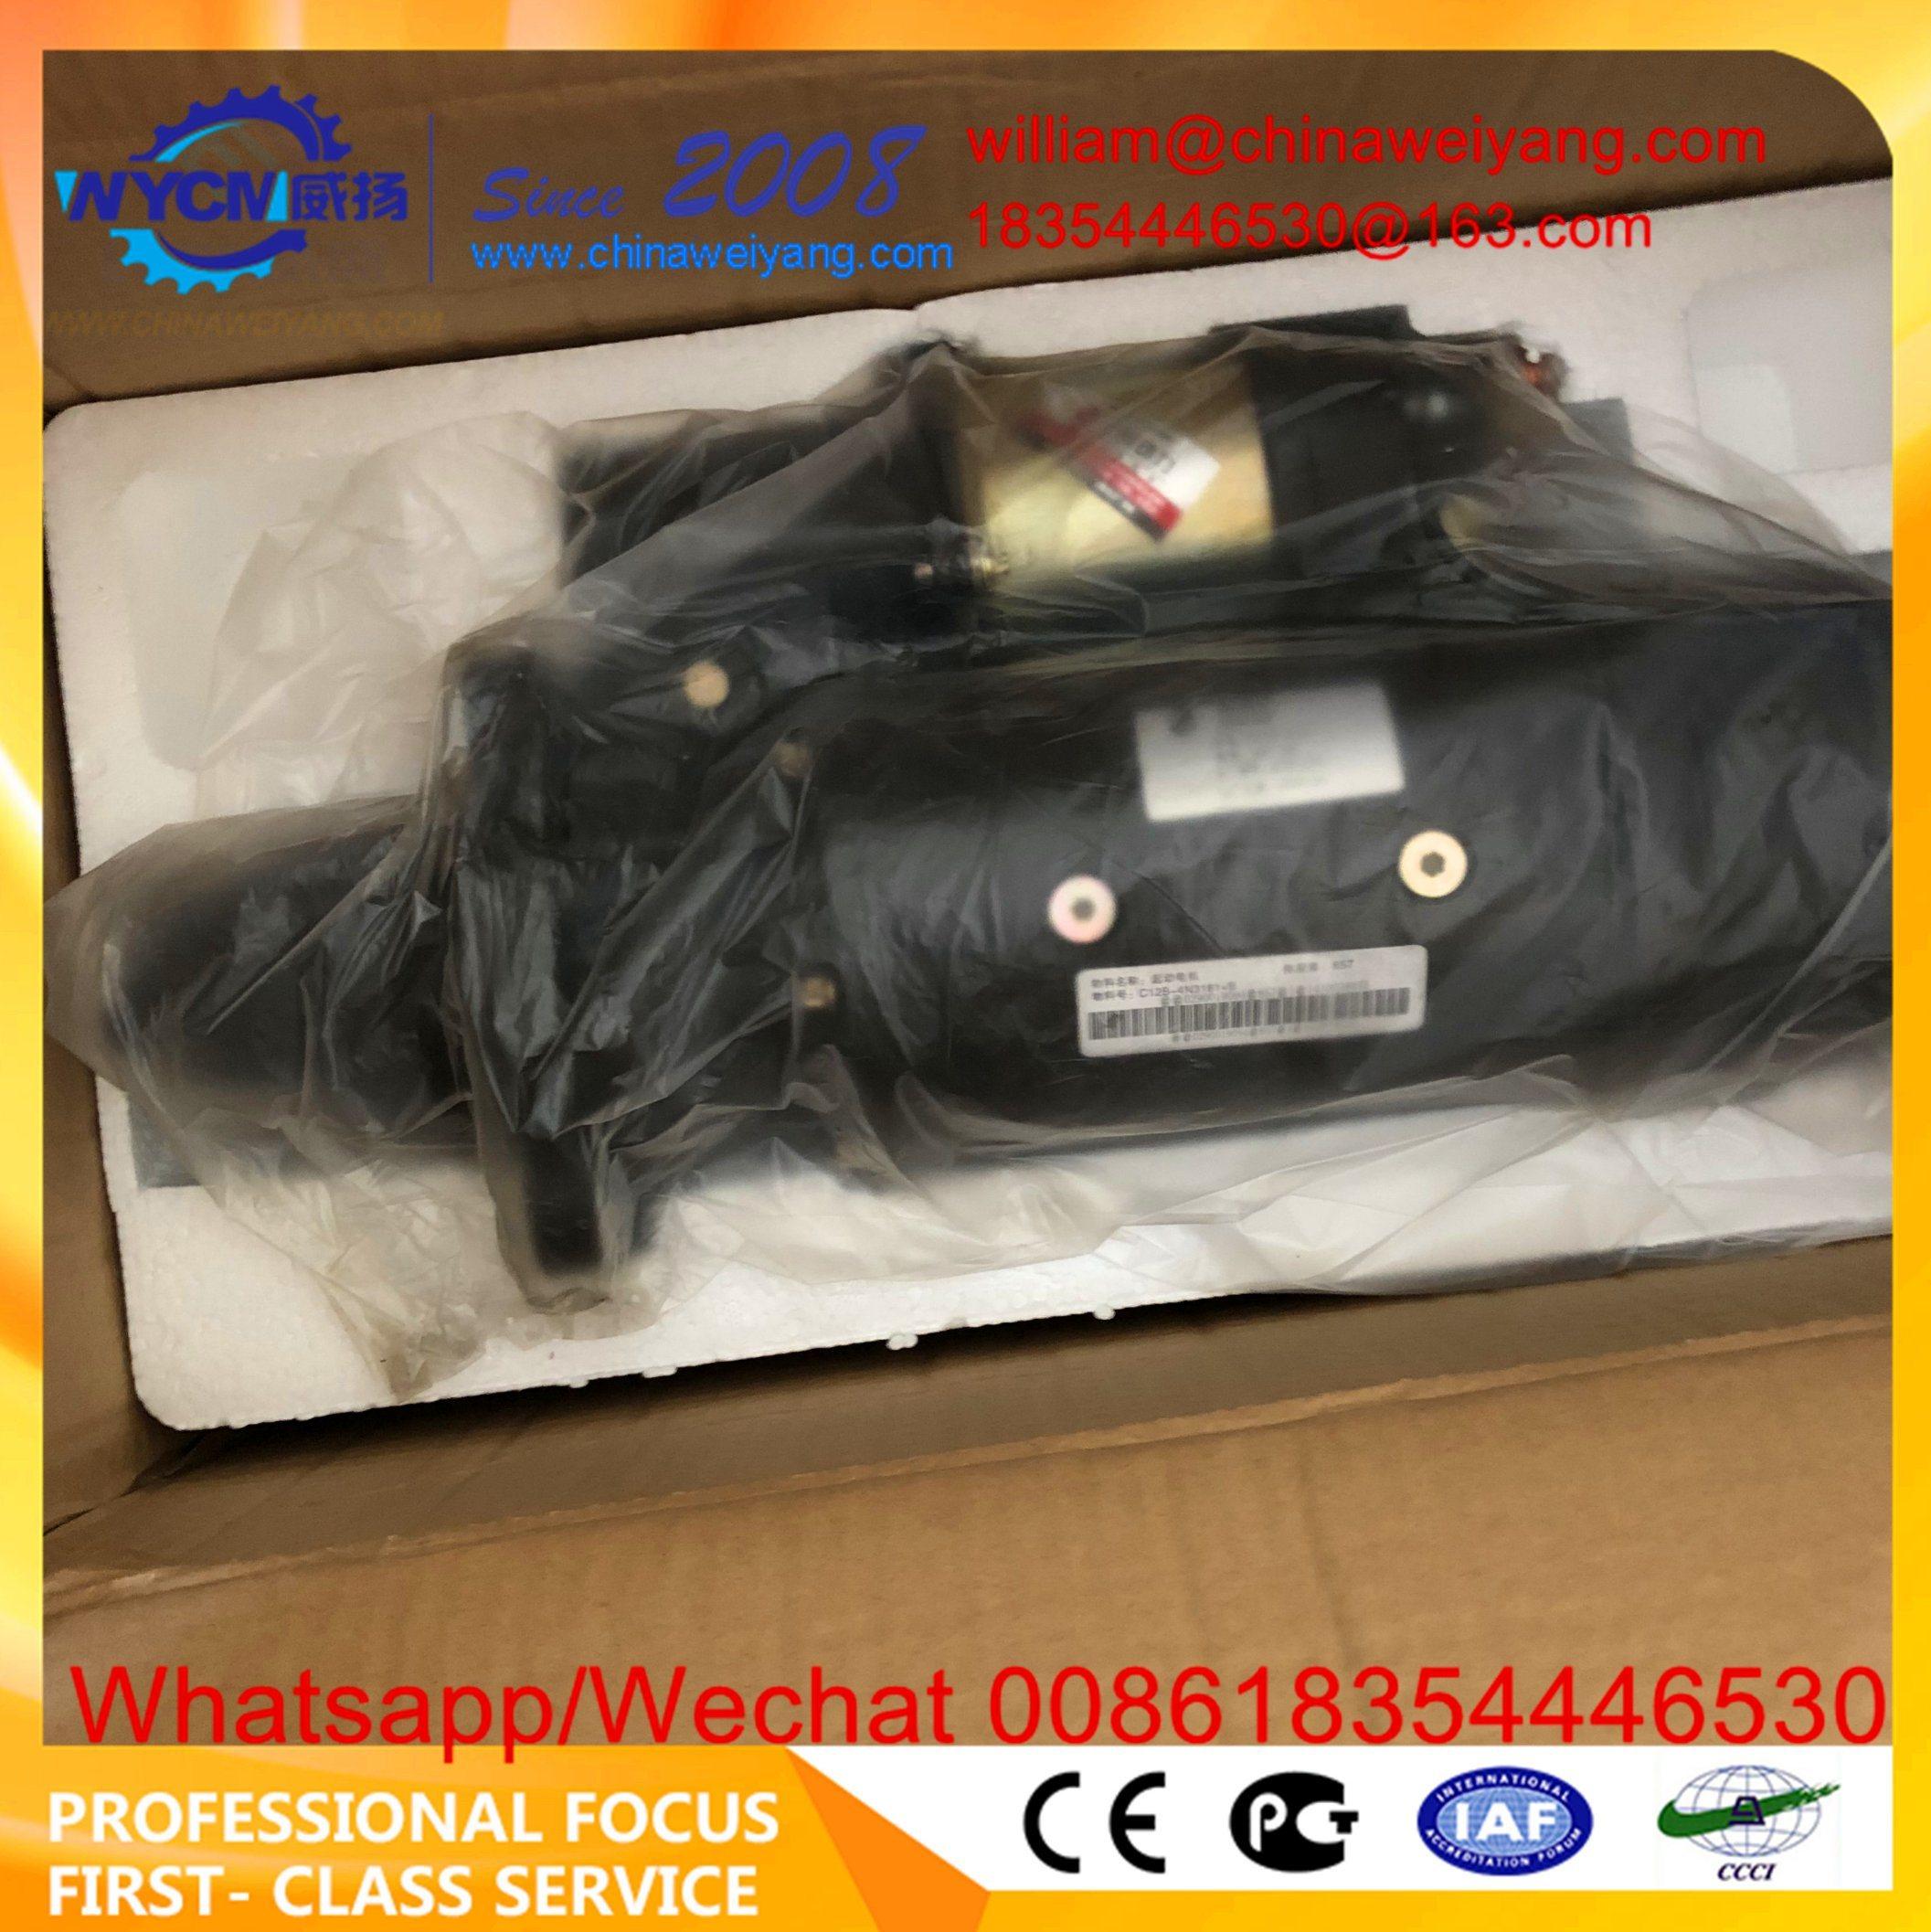 [Hot Item] C6121 4n3181 Starter Shanghai Diesel Engine Spare Parts  C11ab-4n3181+B Motor Starter for Sale